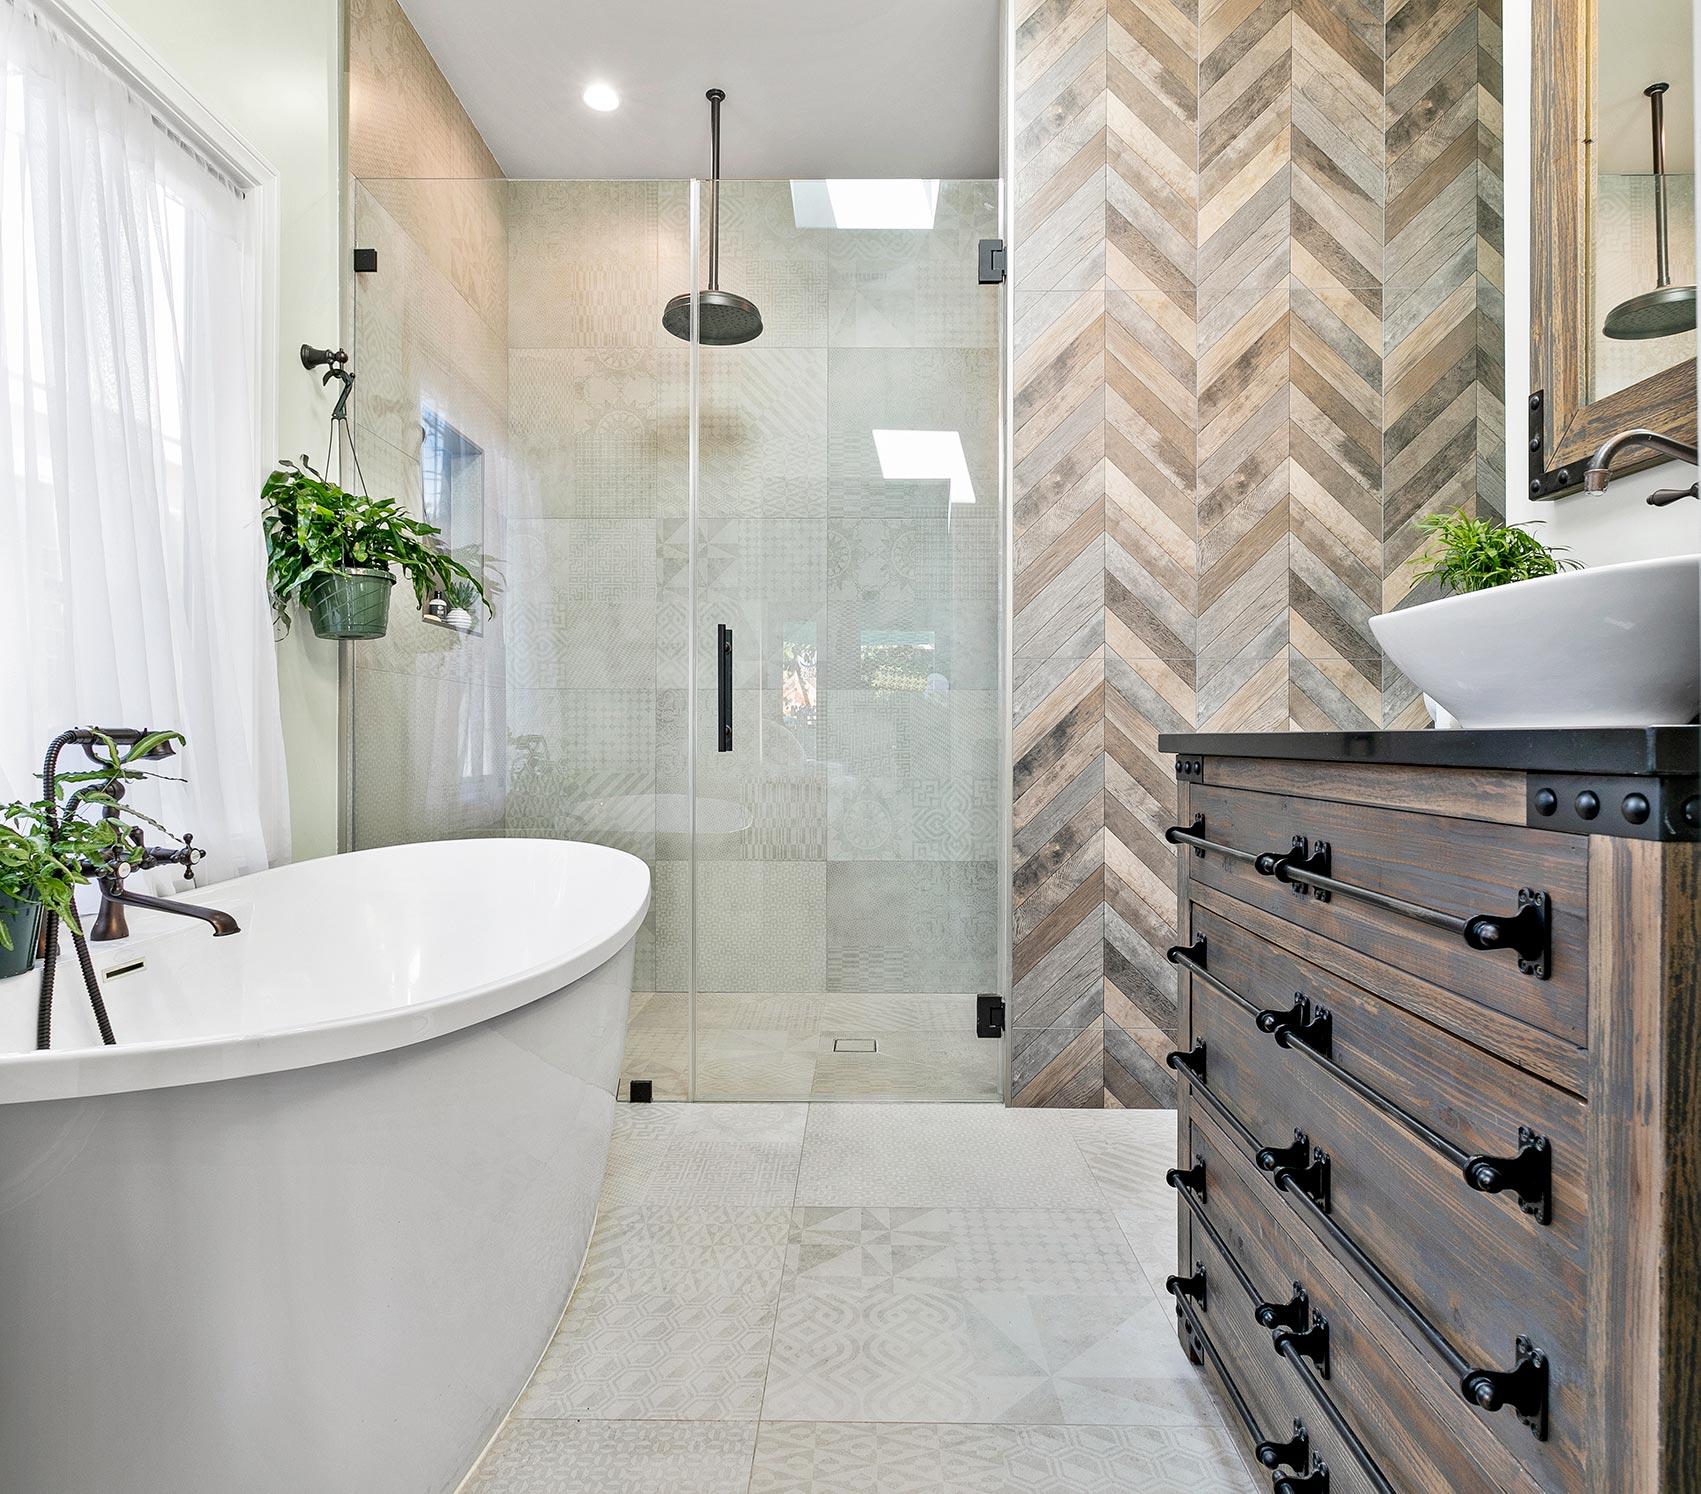 Highland Park complete remodel bathroom 2 SMALL.jpg